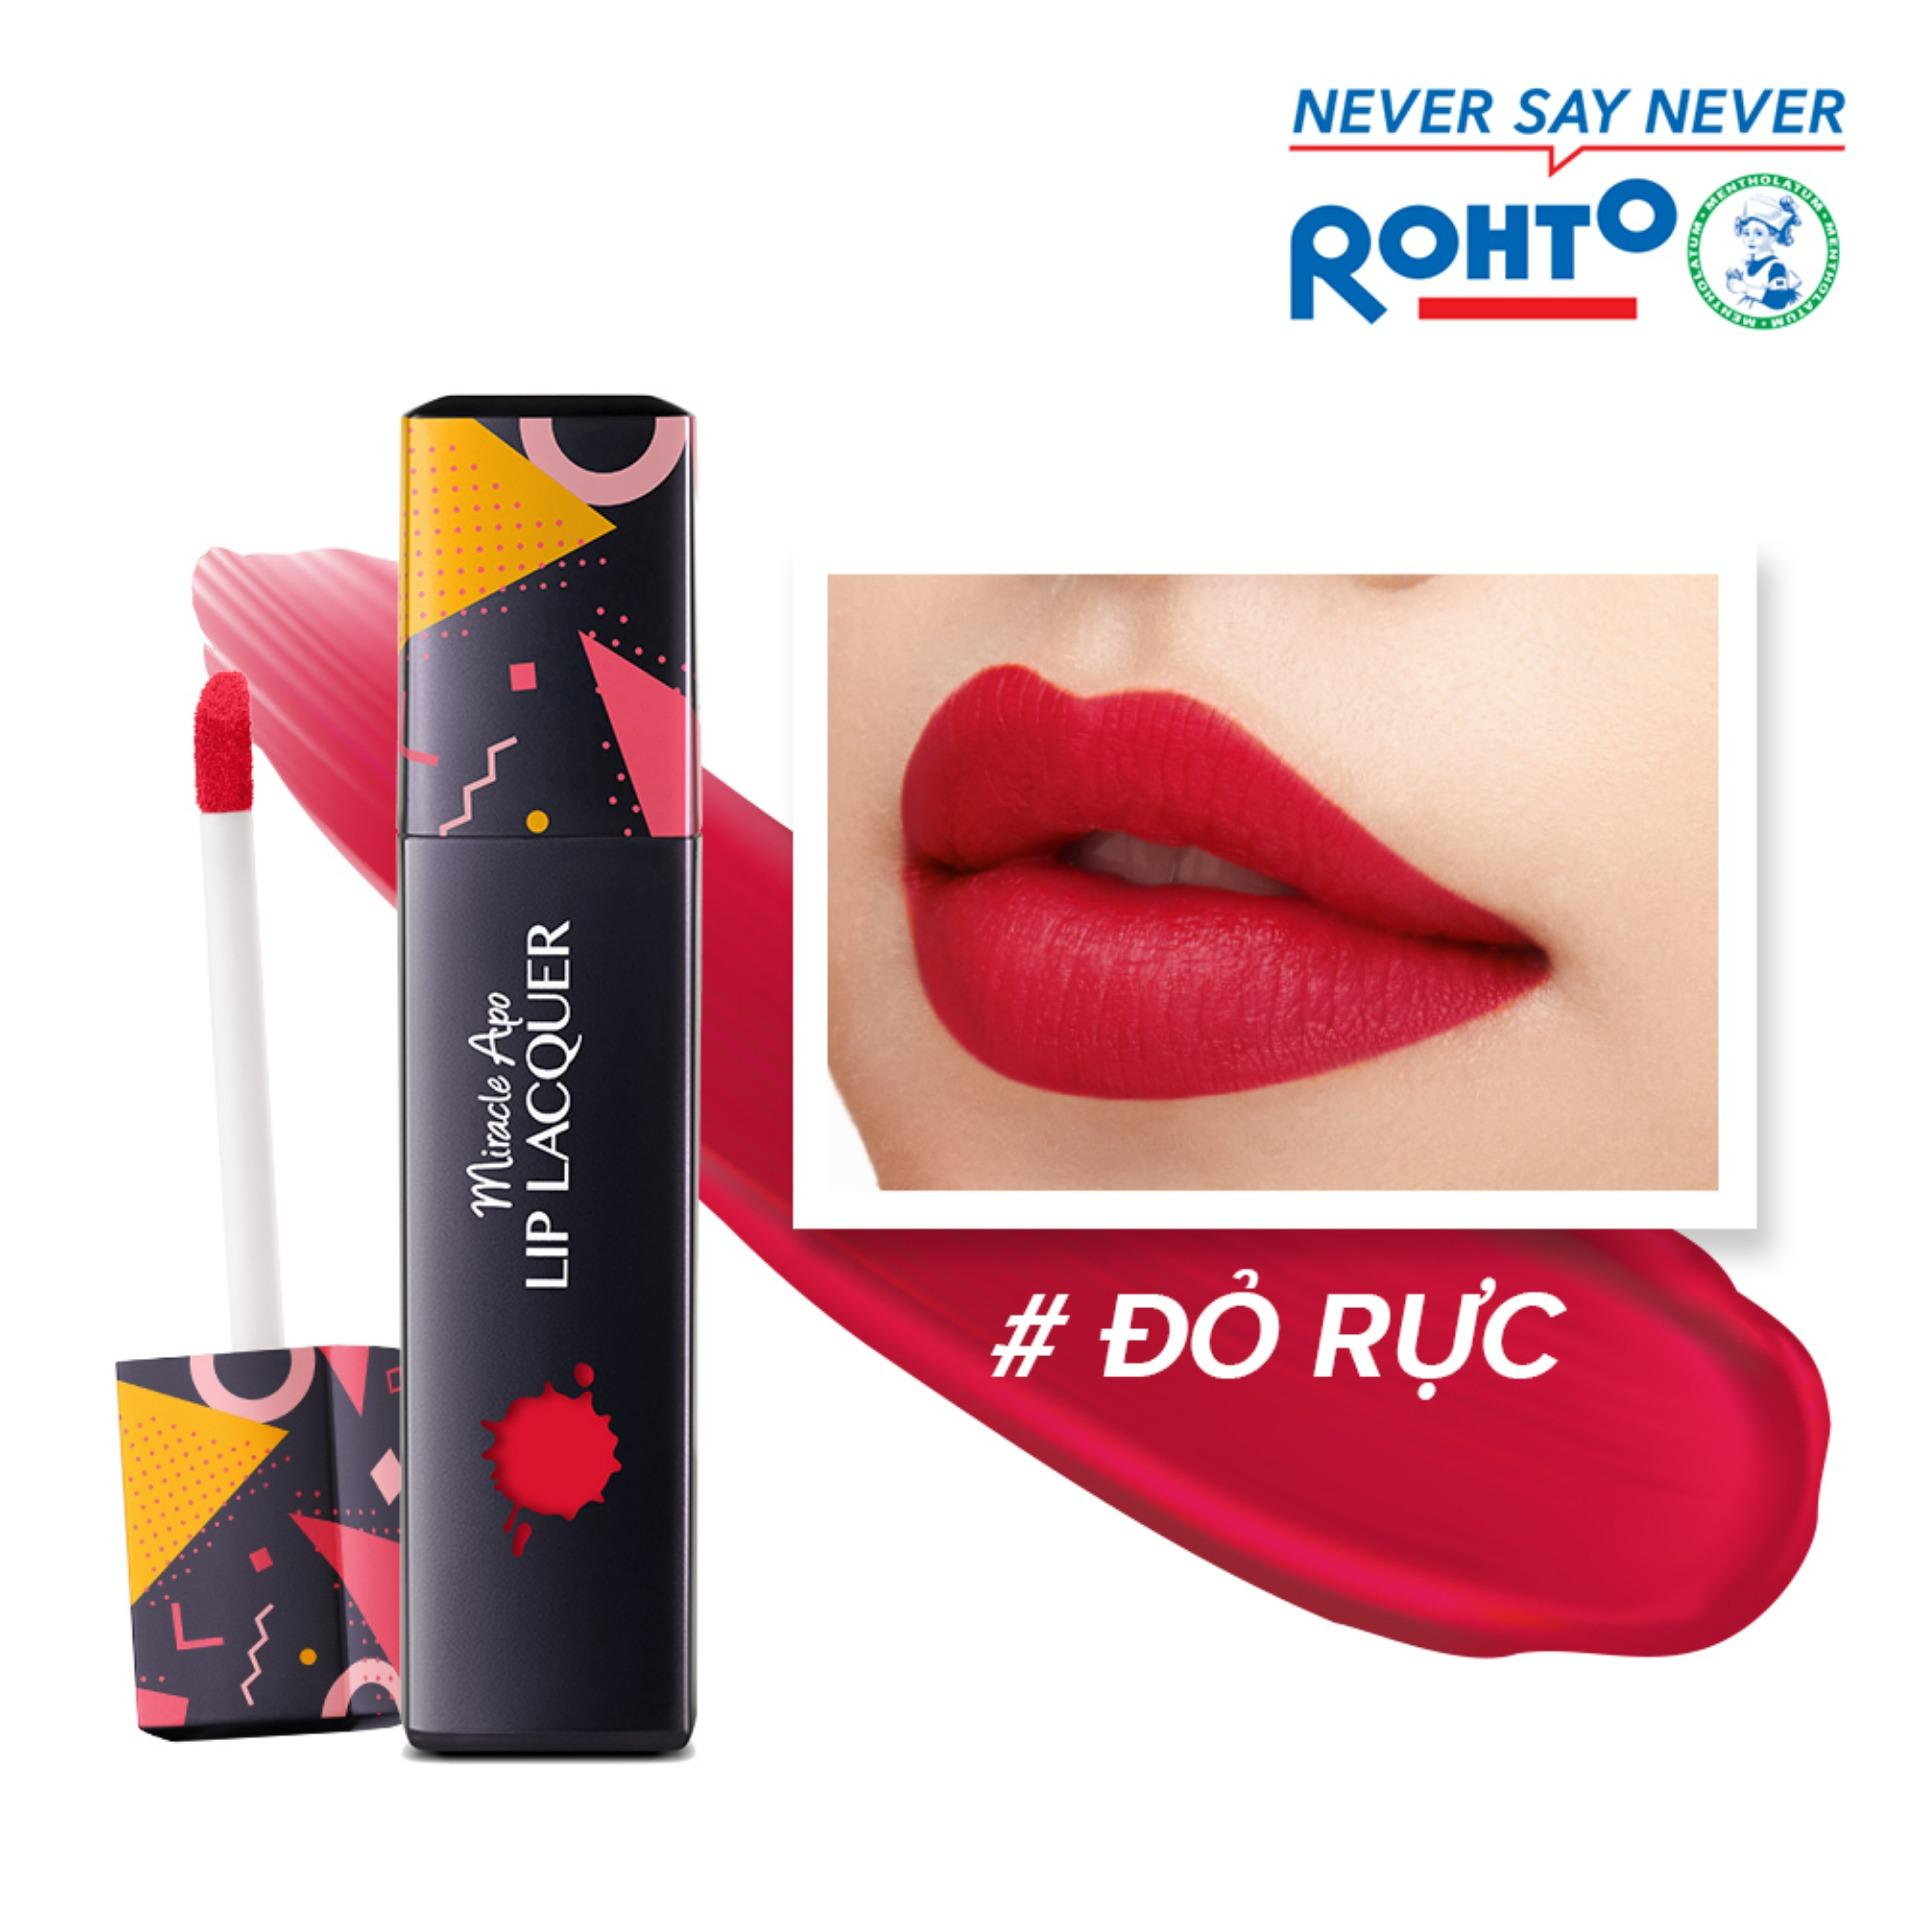 Son kem lì Miracle Apo Lip Lacquer Matte True Red 3ml (Đỏ rực)